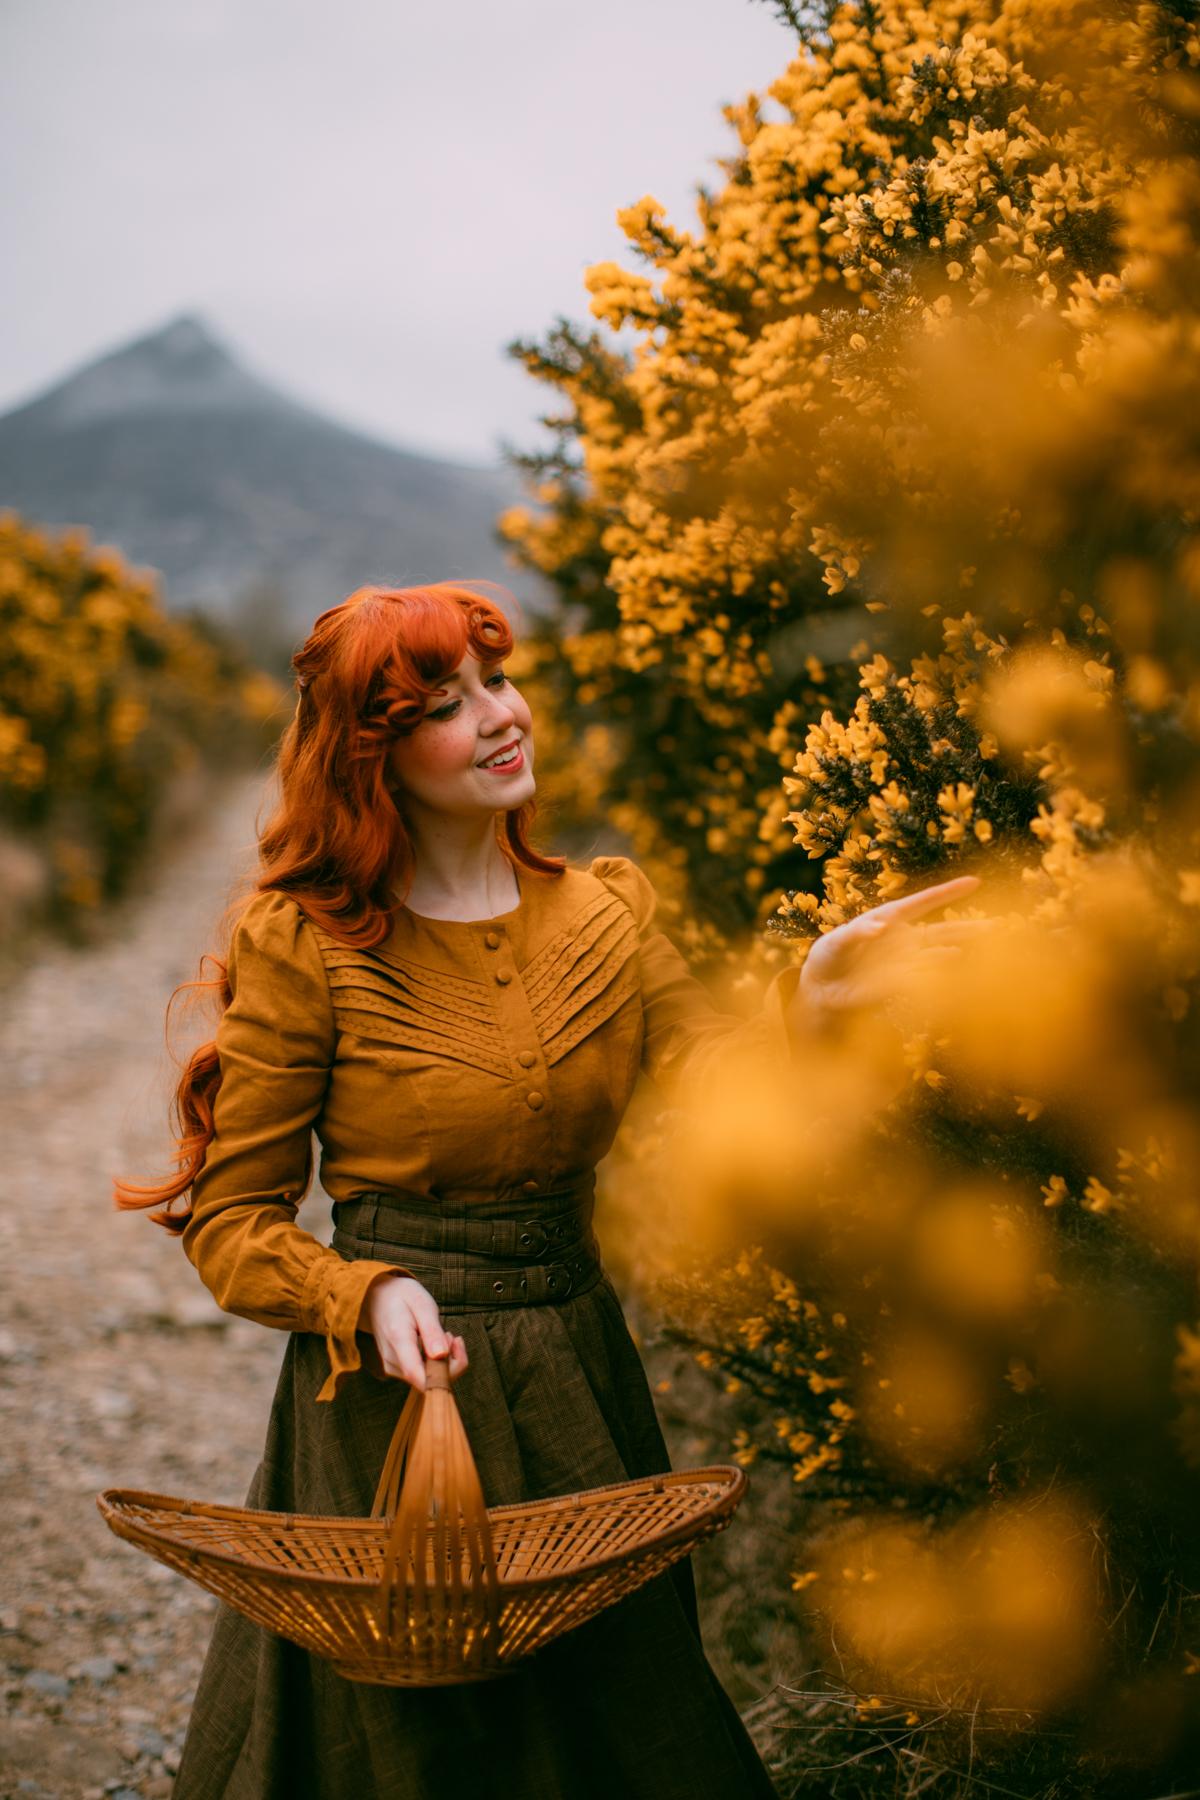 gorse flowers, cottagecore, cottagecore dress, mourne mountains, blouse, ireland, Revintaria, leaf embroidery